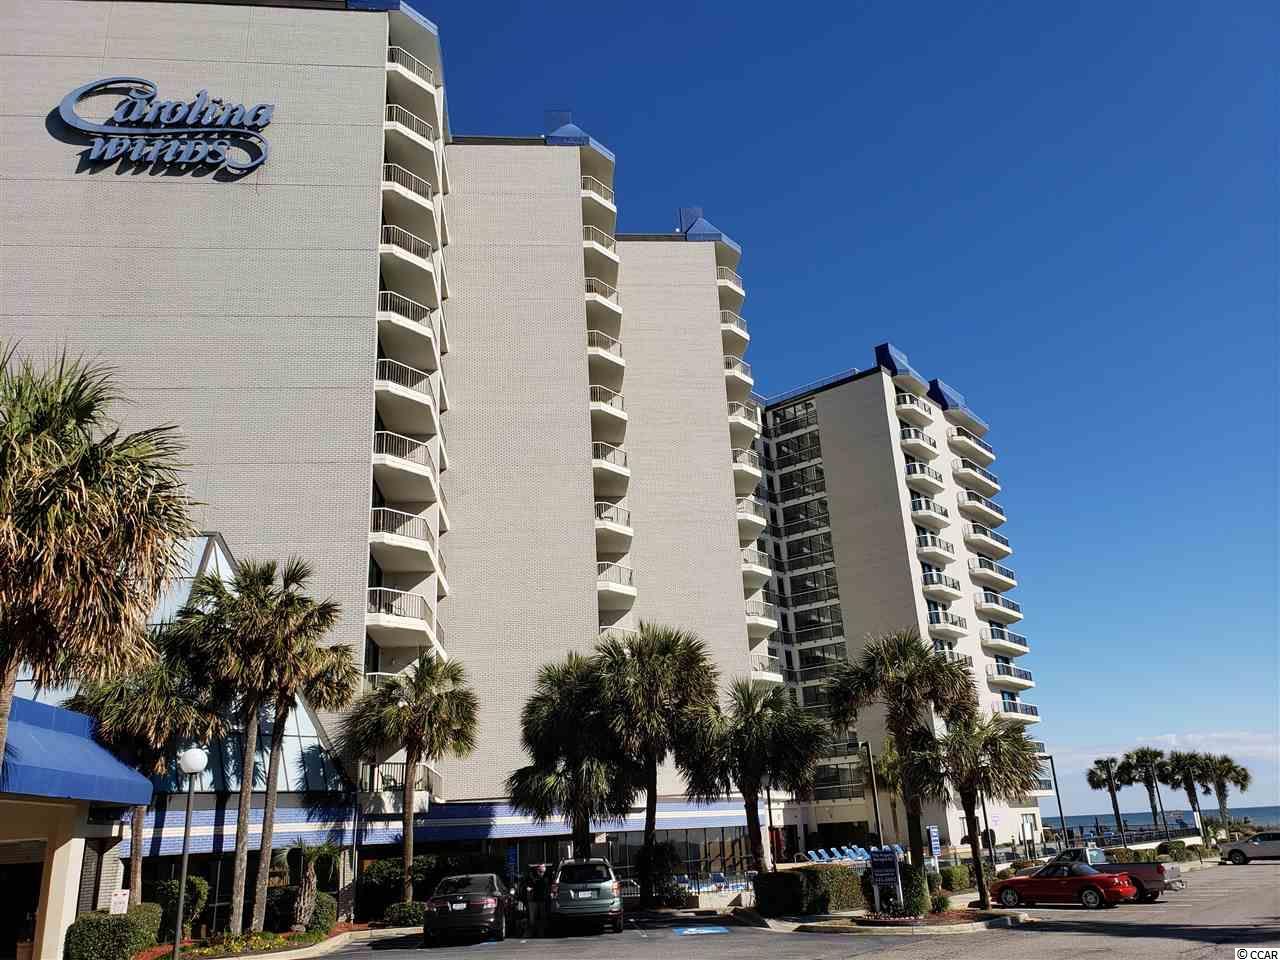 200 76th Ave N Unit 1005 Myrtle Beach